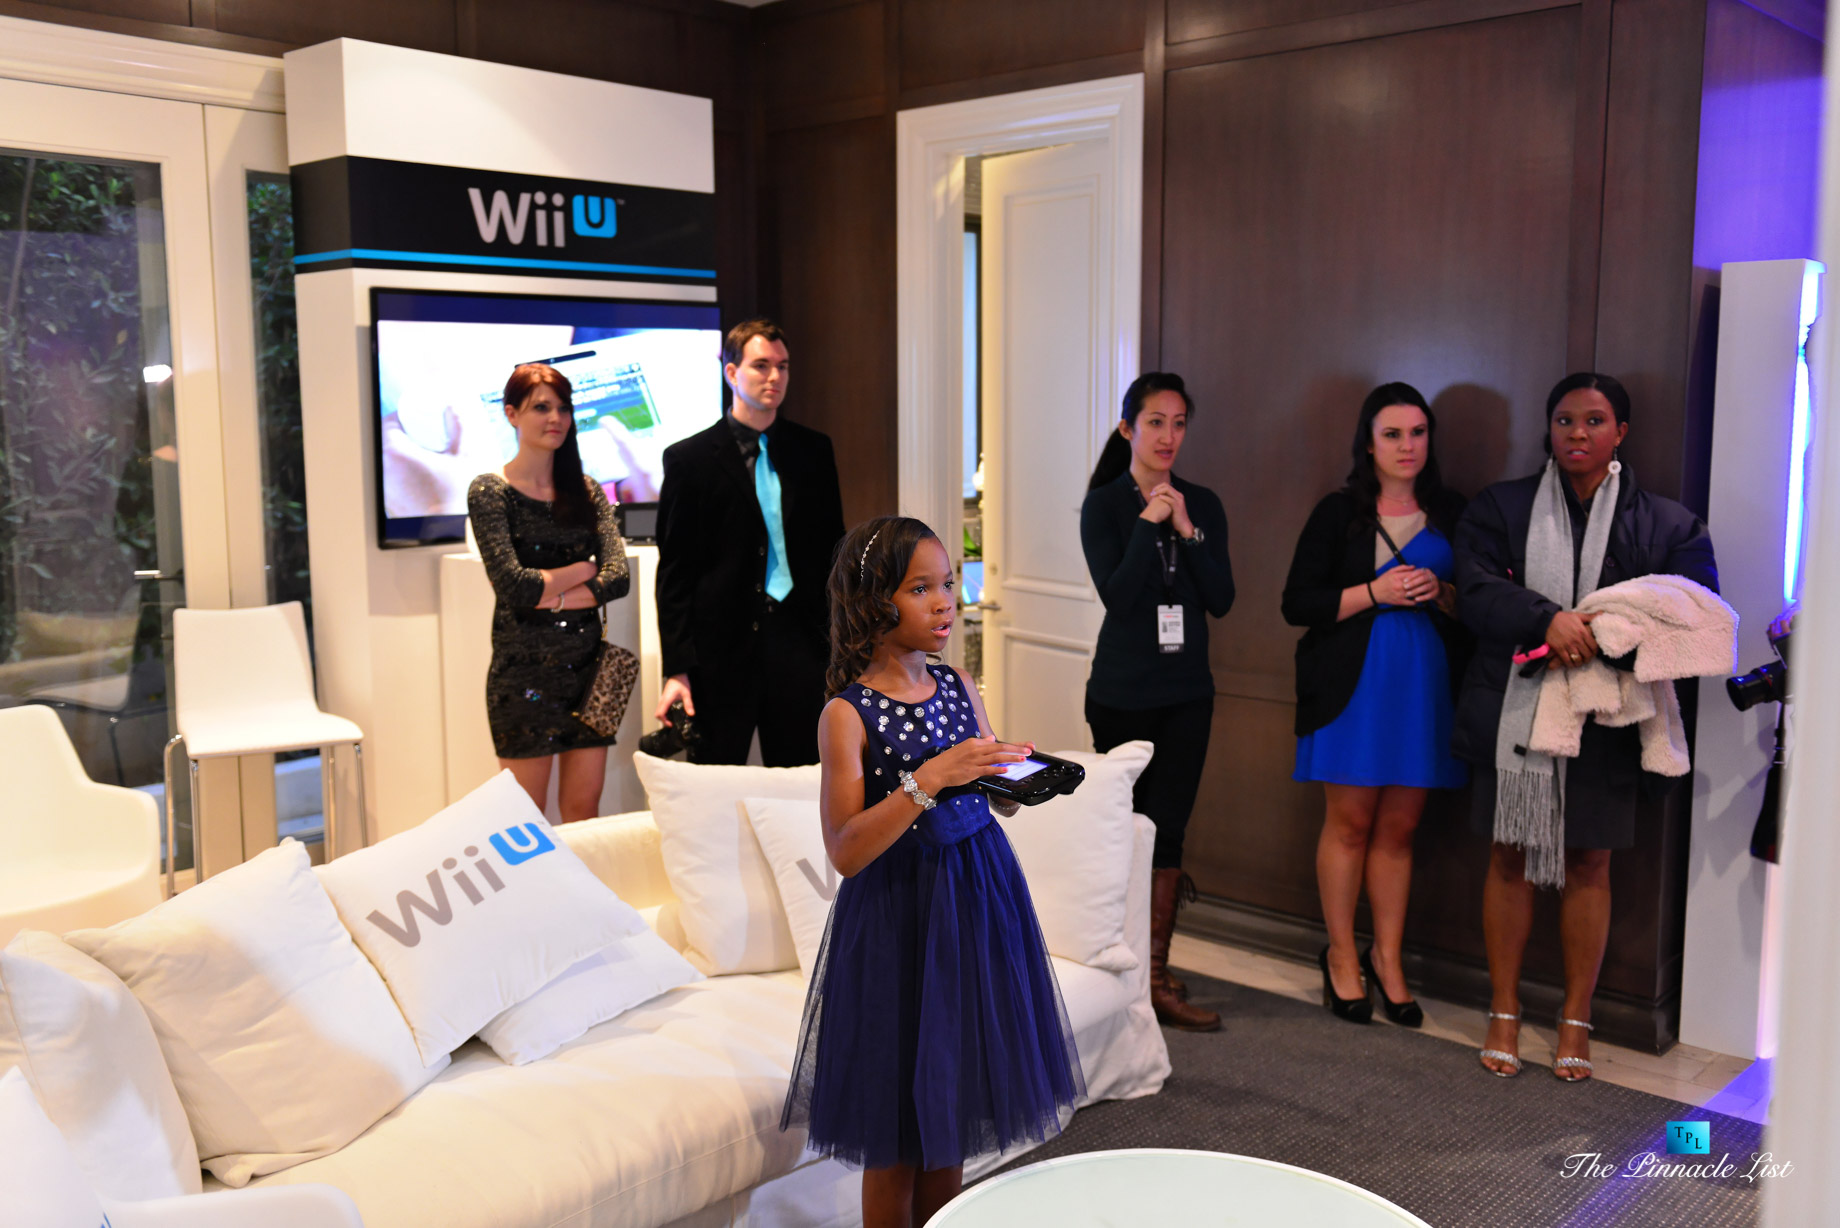 Quvenzhane Wallis – Rolls-Royce Hosts The Variety Studio Event with Nintendo Wii U in Beverly Hills, California